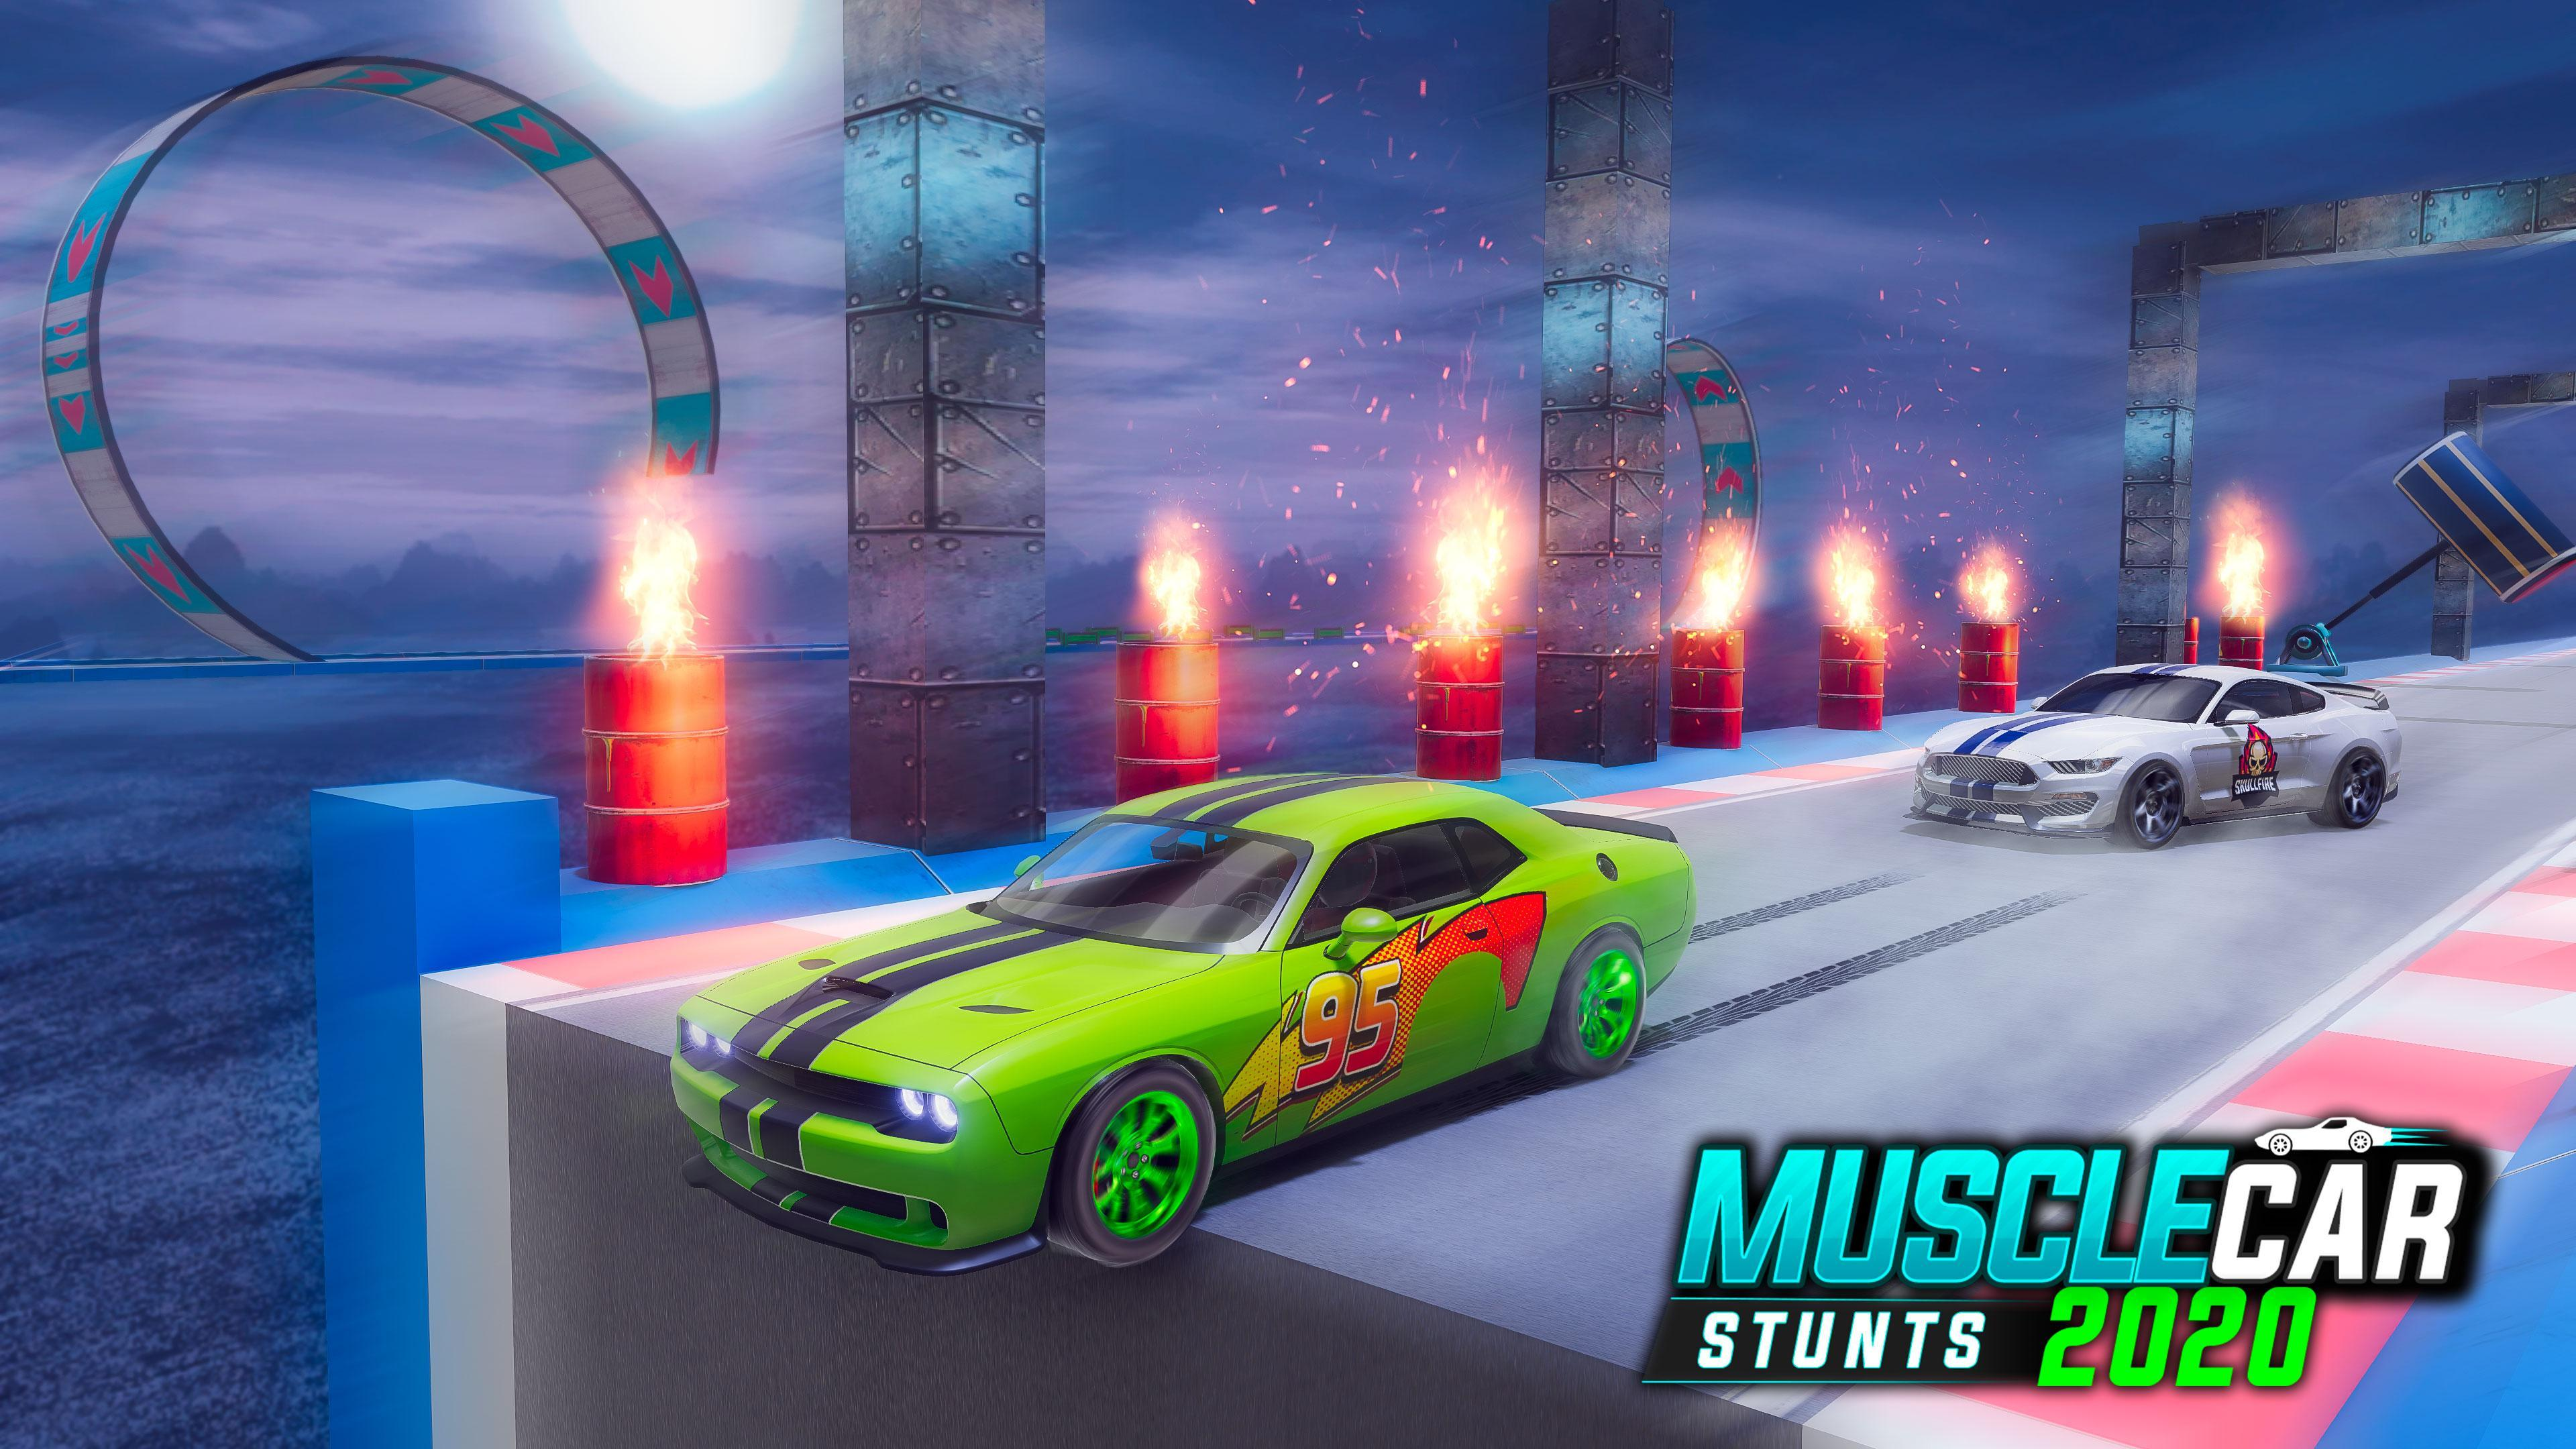 Muscle Car Stunts 2020 Mega Ramp Stunt Car Games 1.0.9 Screenshot 5